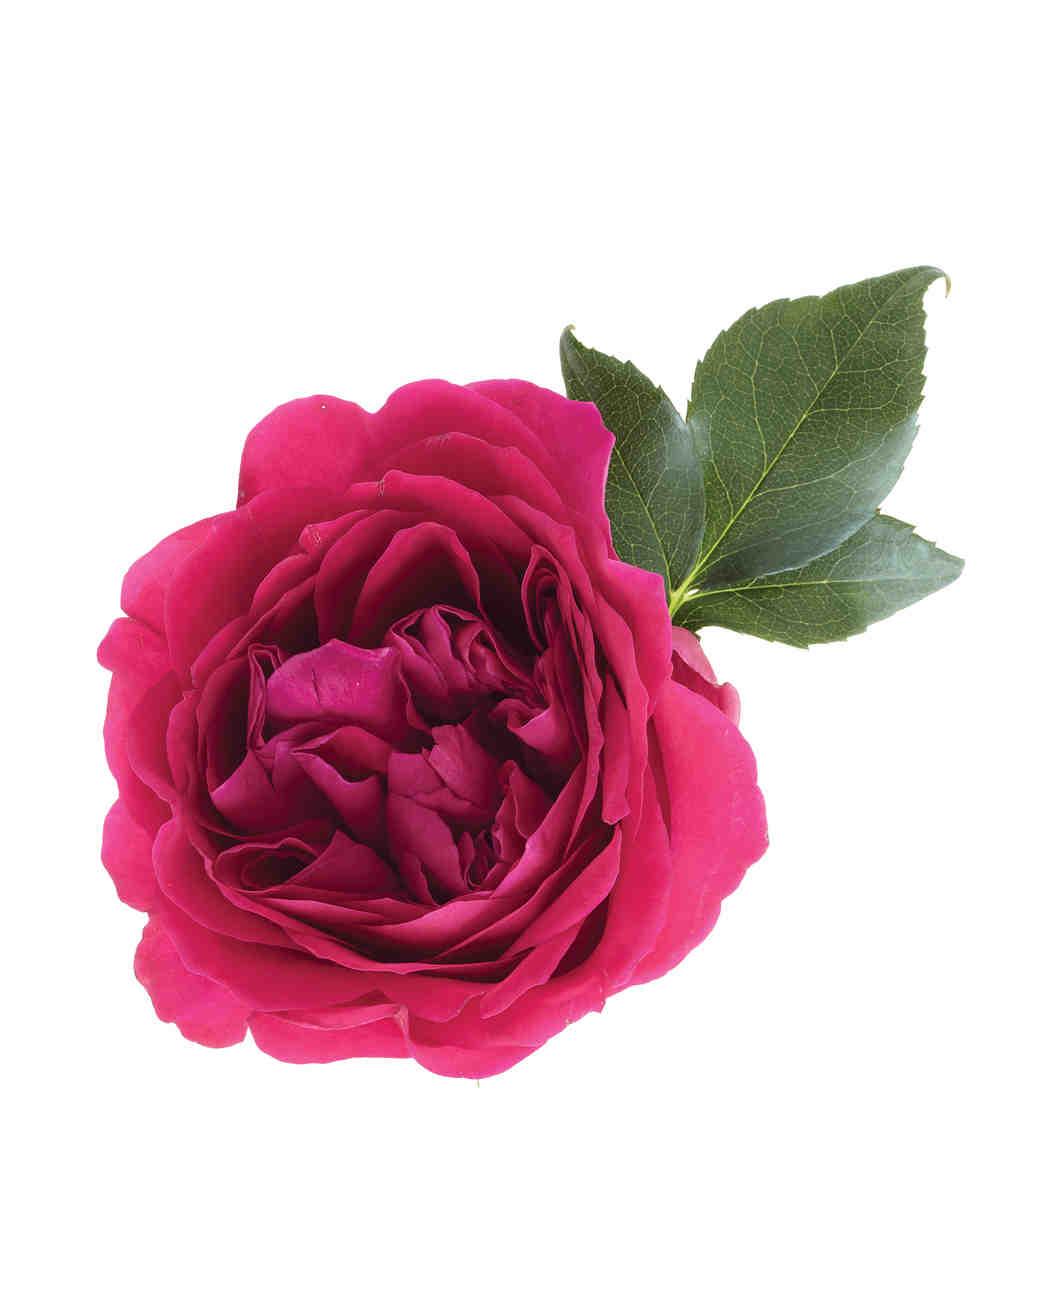 flower-0811mwd107539.jpg